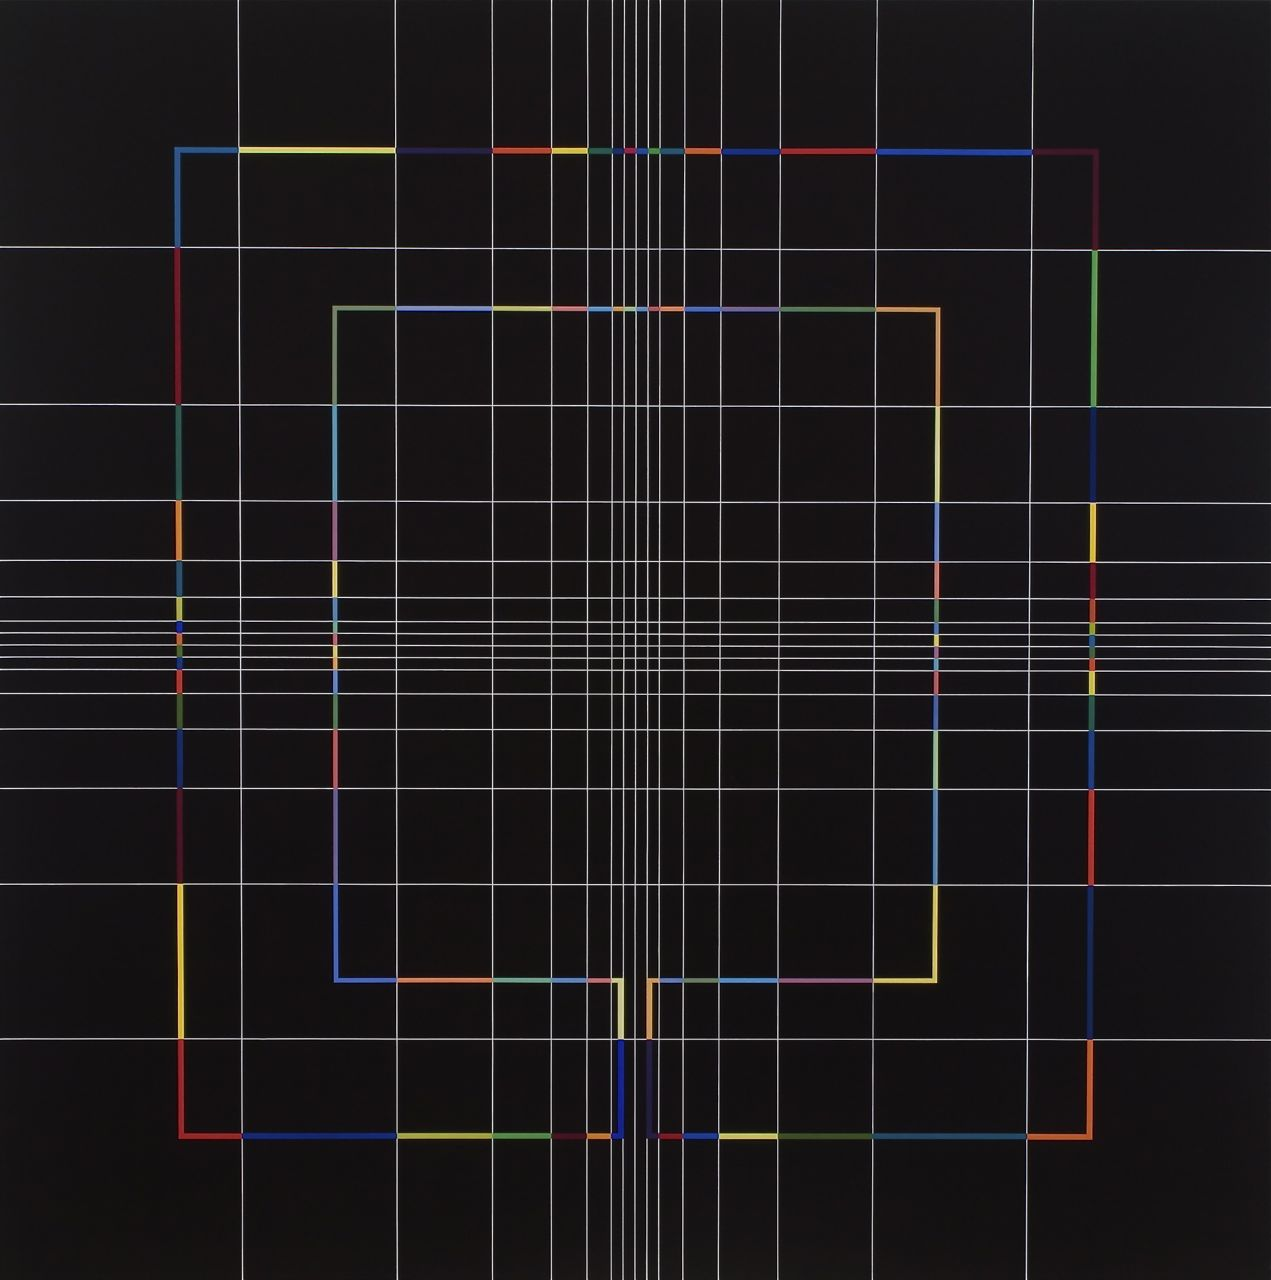 Yantra-ipsum(2)2009.Sep, acrylic on canvas, 53 3/16 x 53 3/16 in.[135x135cm]